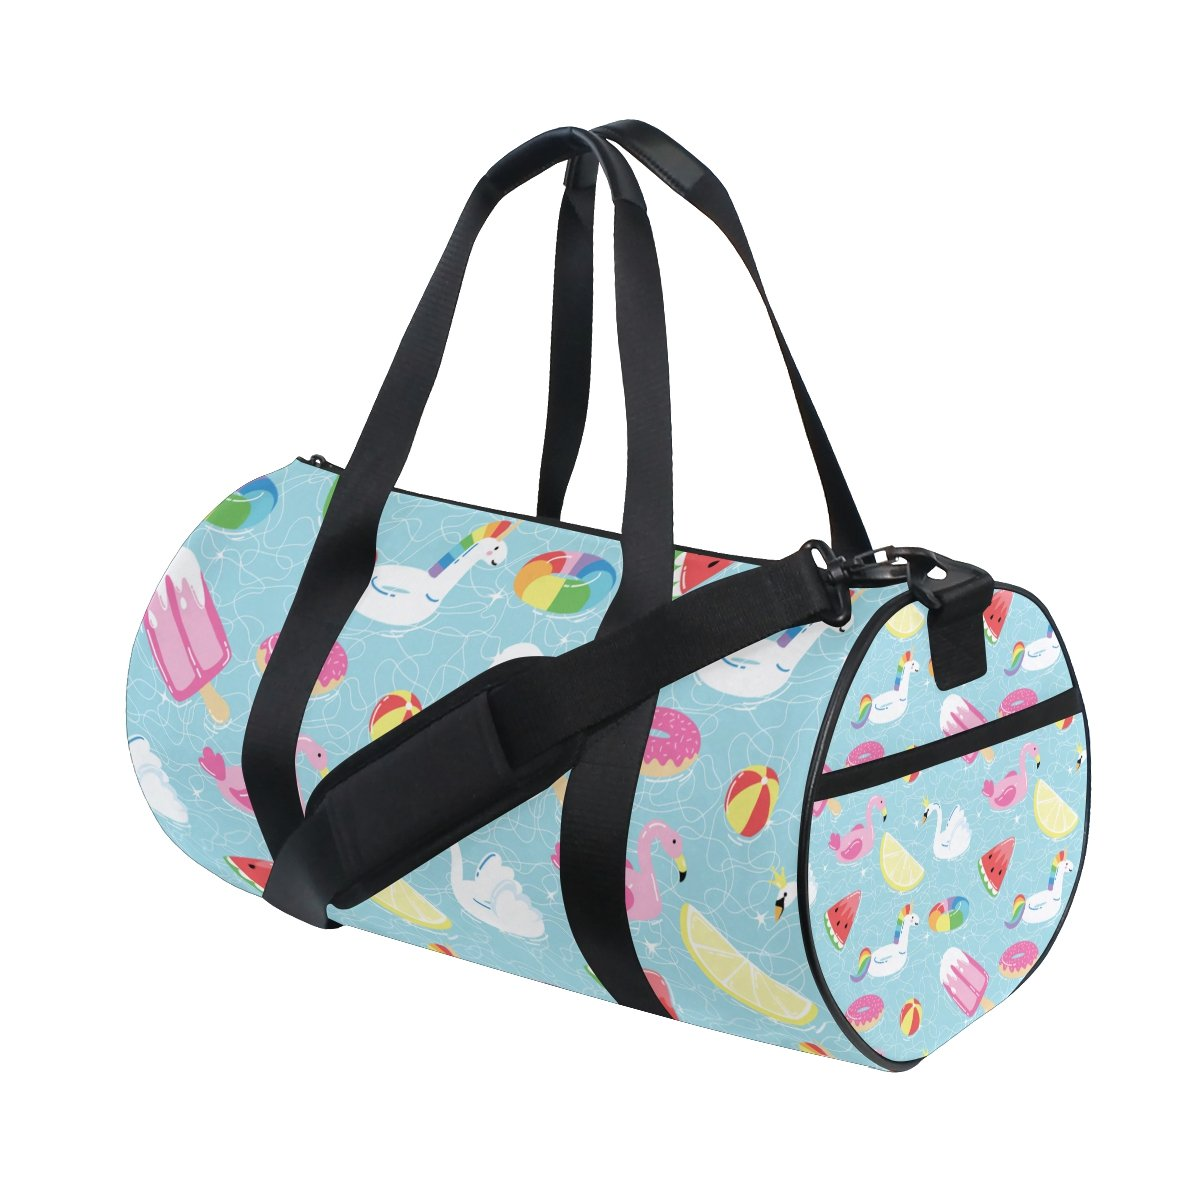 U LIFE Cute Summer Unicorn Swimming Watermelon Lemon Swan Sports Gym Shoulder Handy Duffel Bags for Women Men Kids Boys Girls